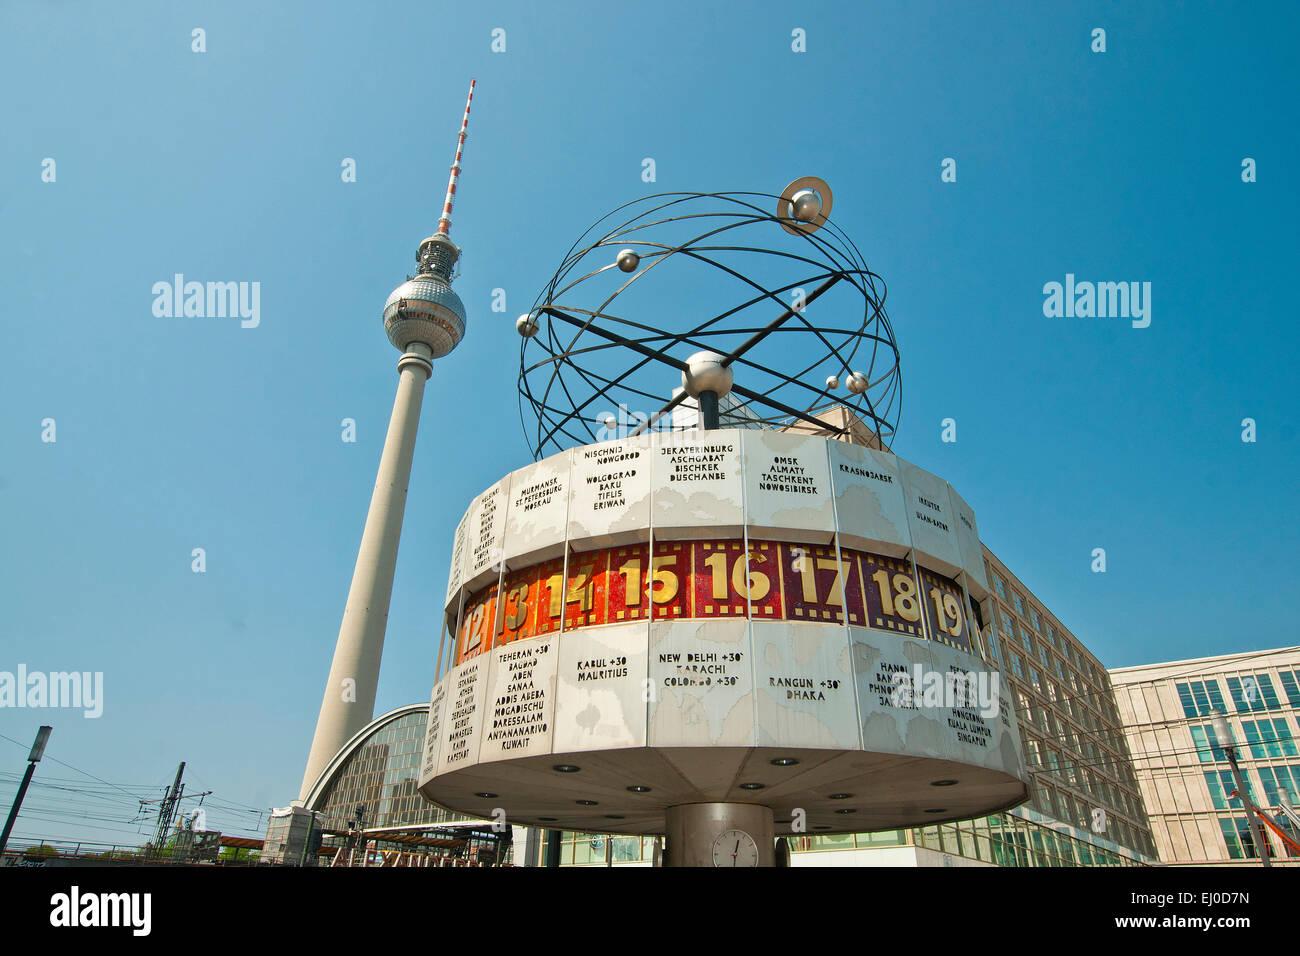 Germany, Berlin, monument, Urania, world time clock, clock, world time, Urania, Alexander place, block of flats, Stock Photo